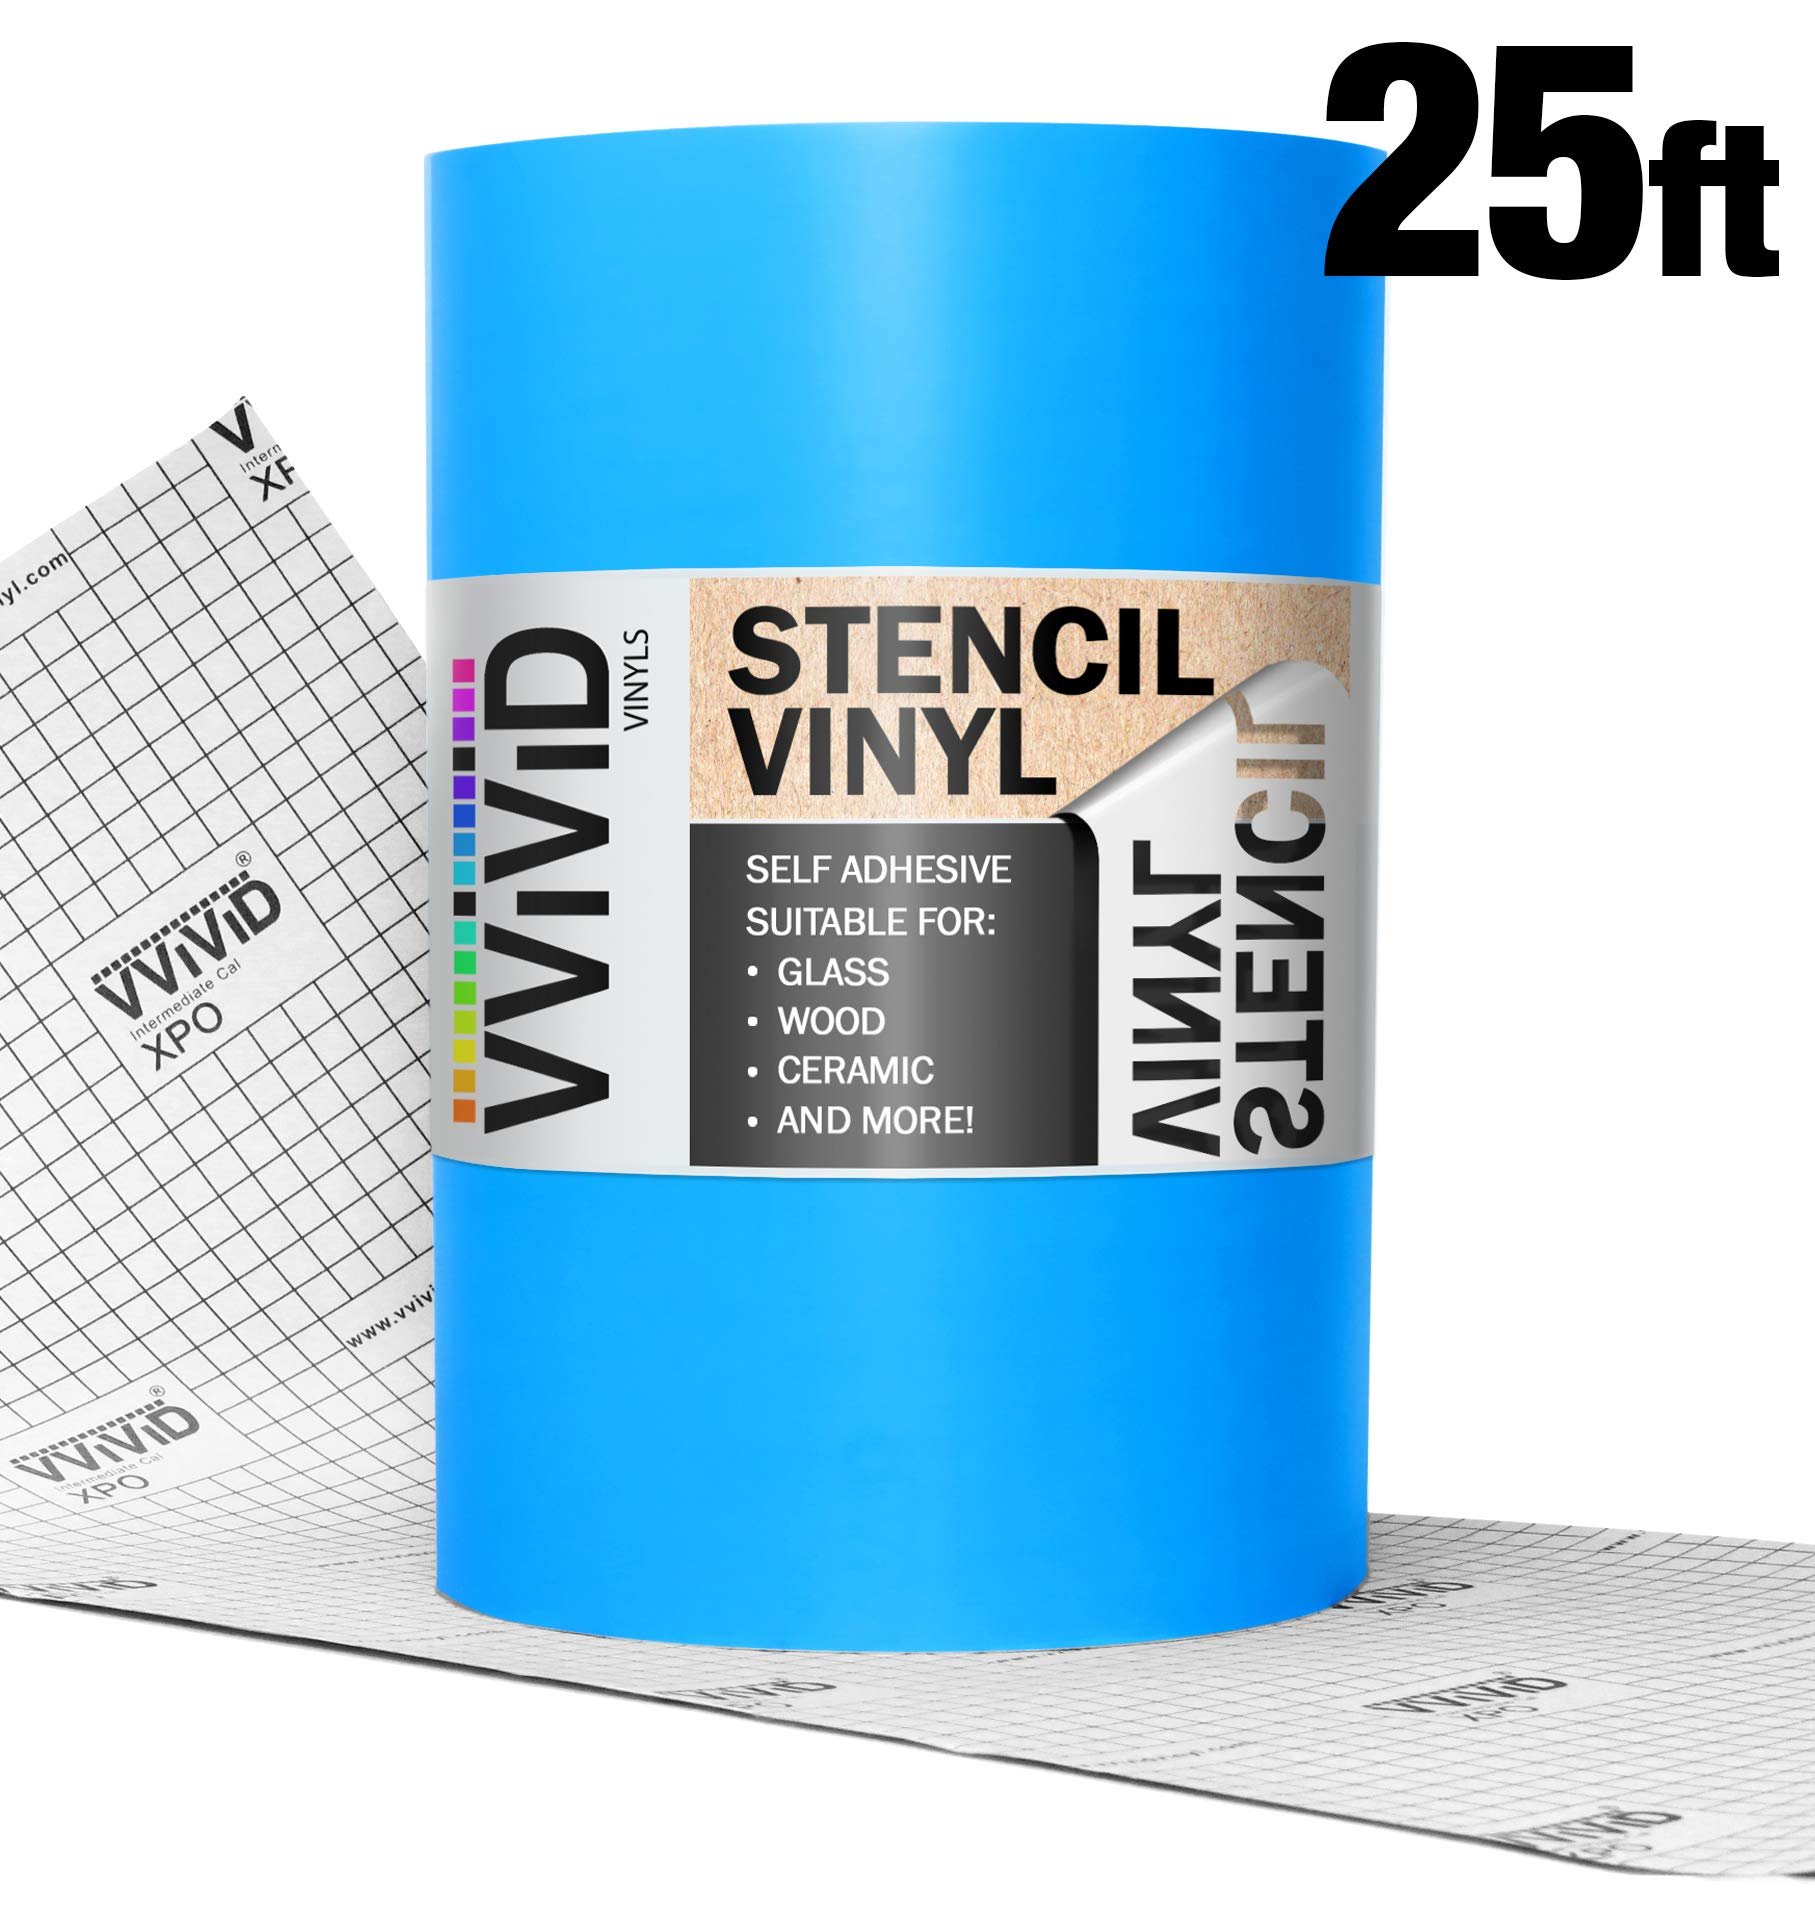 VViViD Blue Low-Tack Adhesive Vinyl Stencil Masking Film Roll (12'' x 25ft)